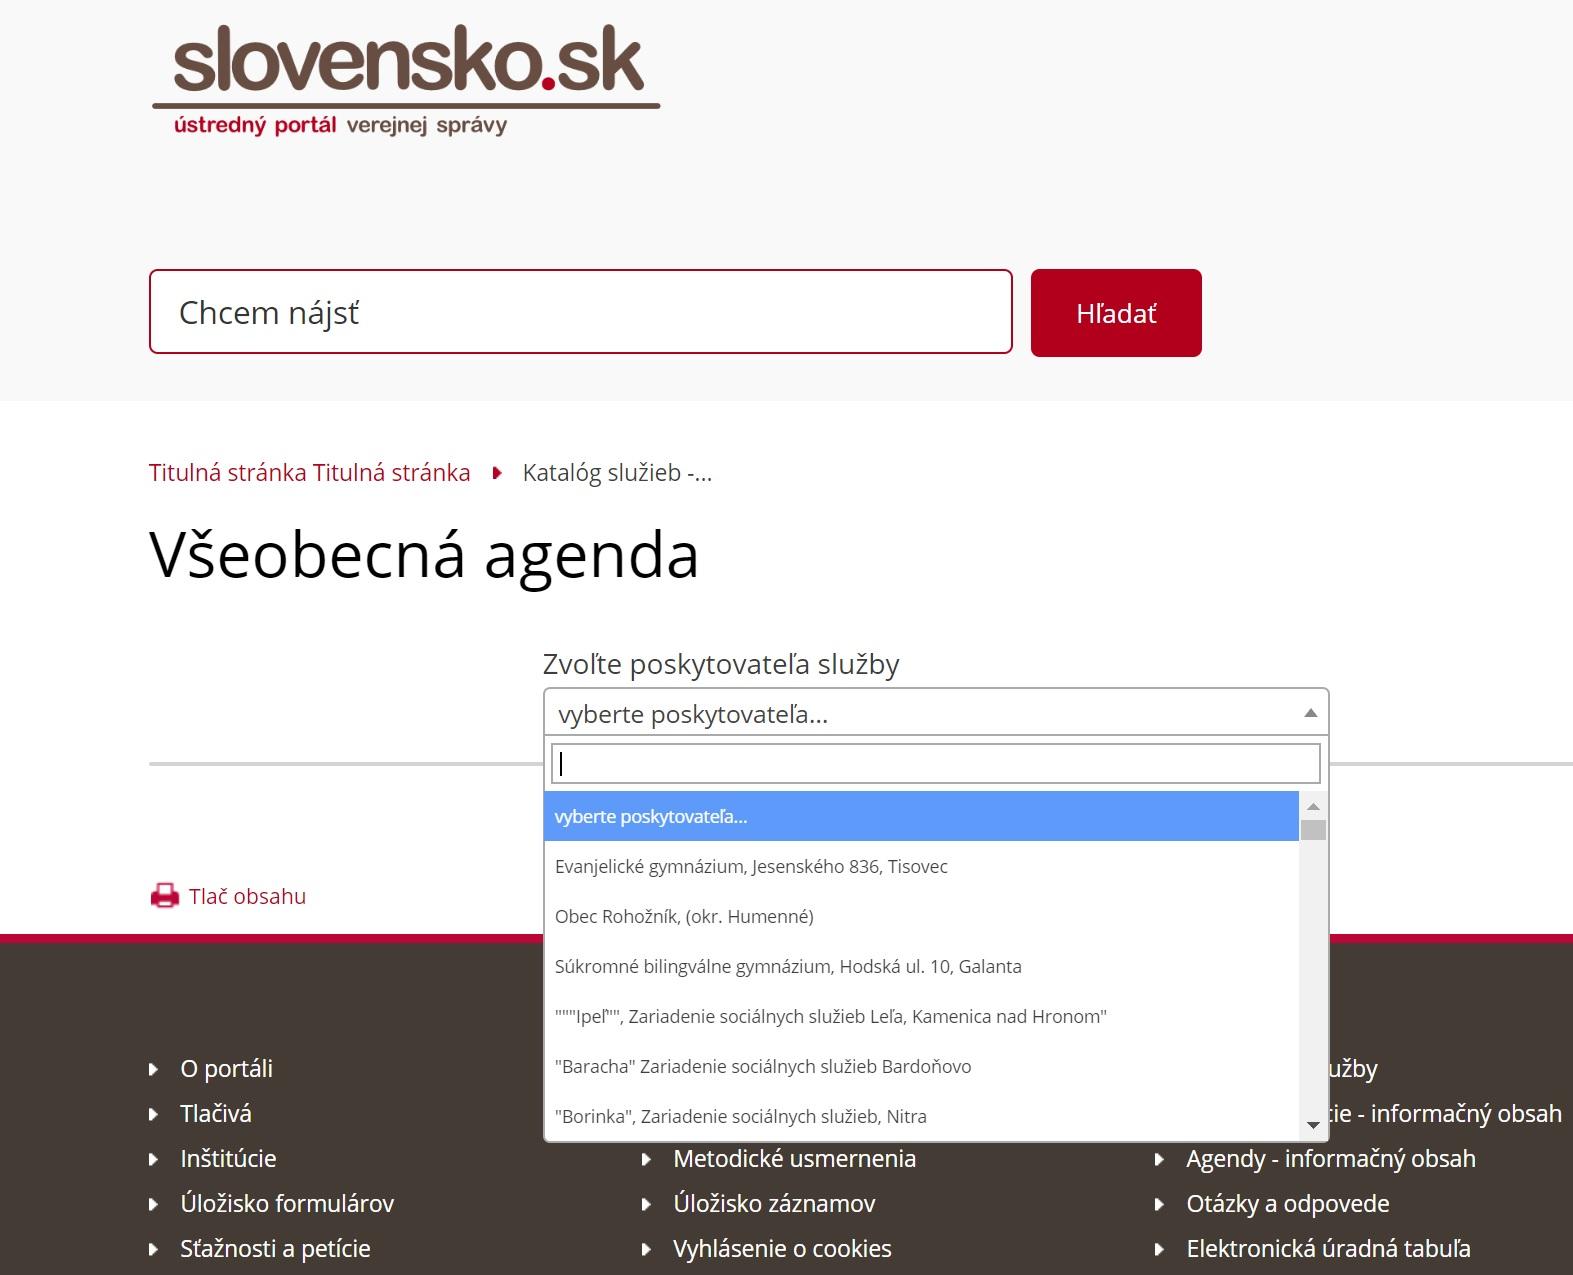 slovensko.sk hladanie